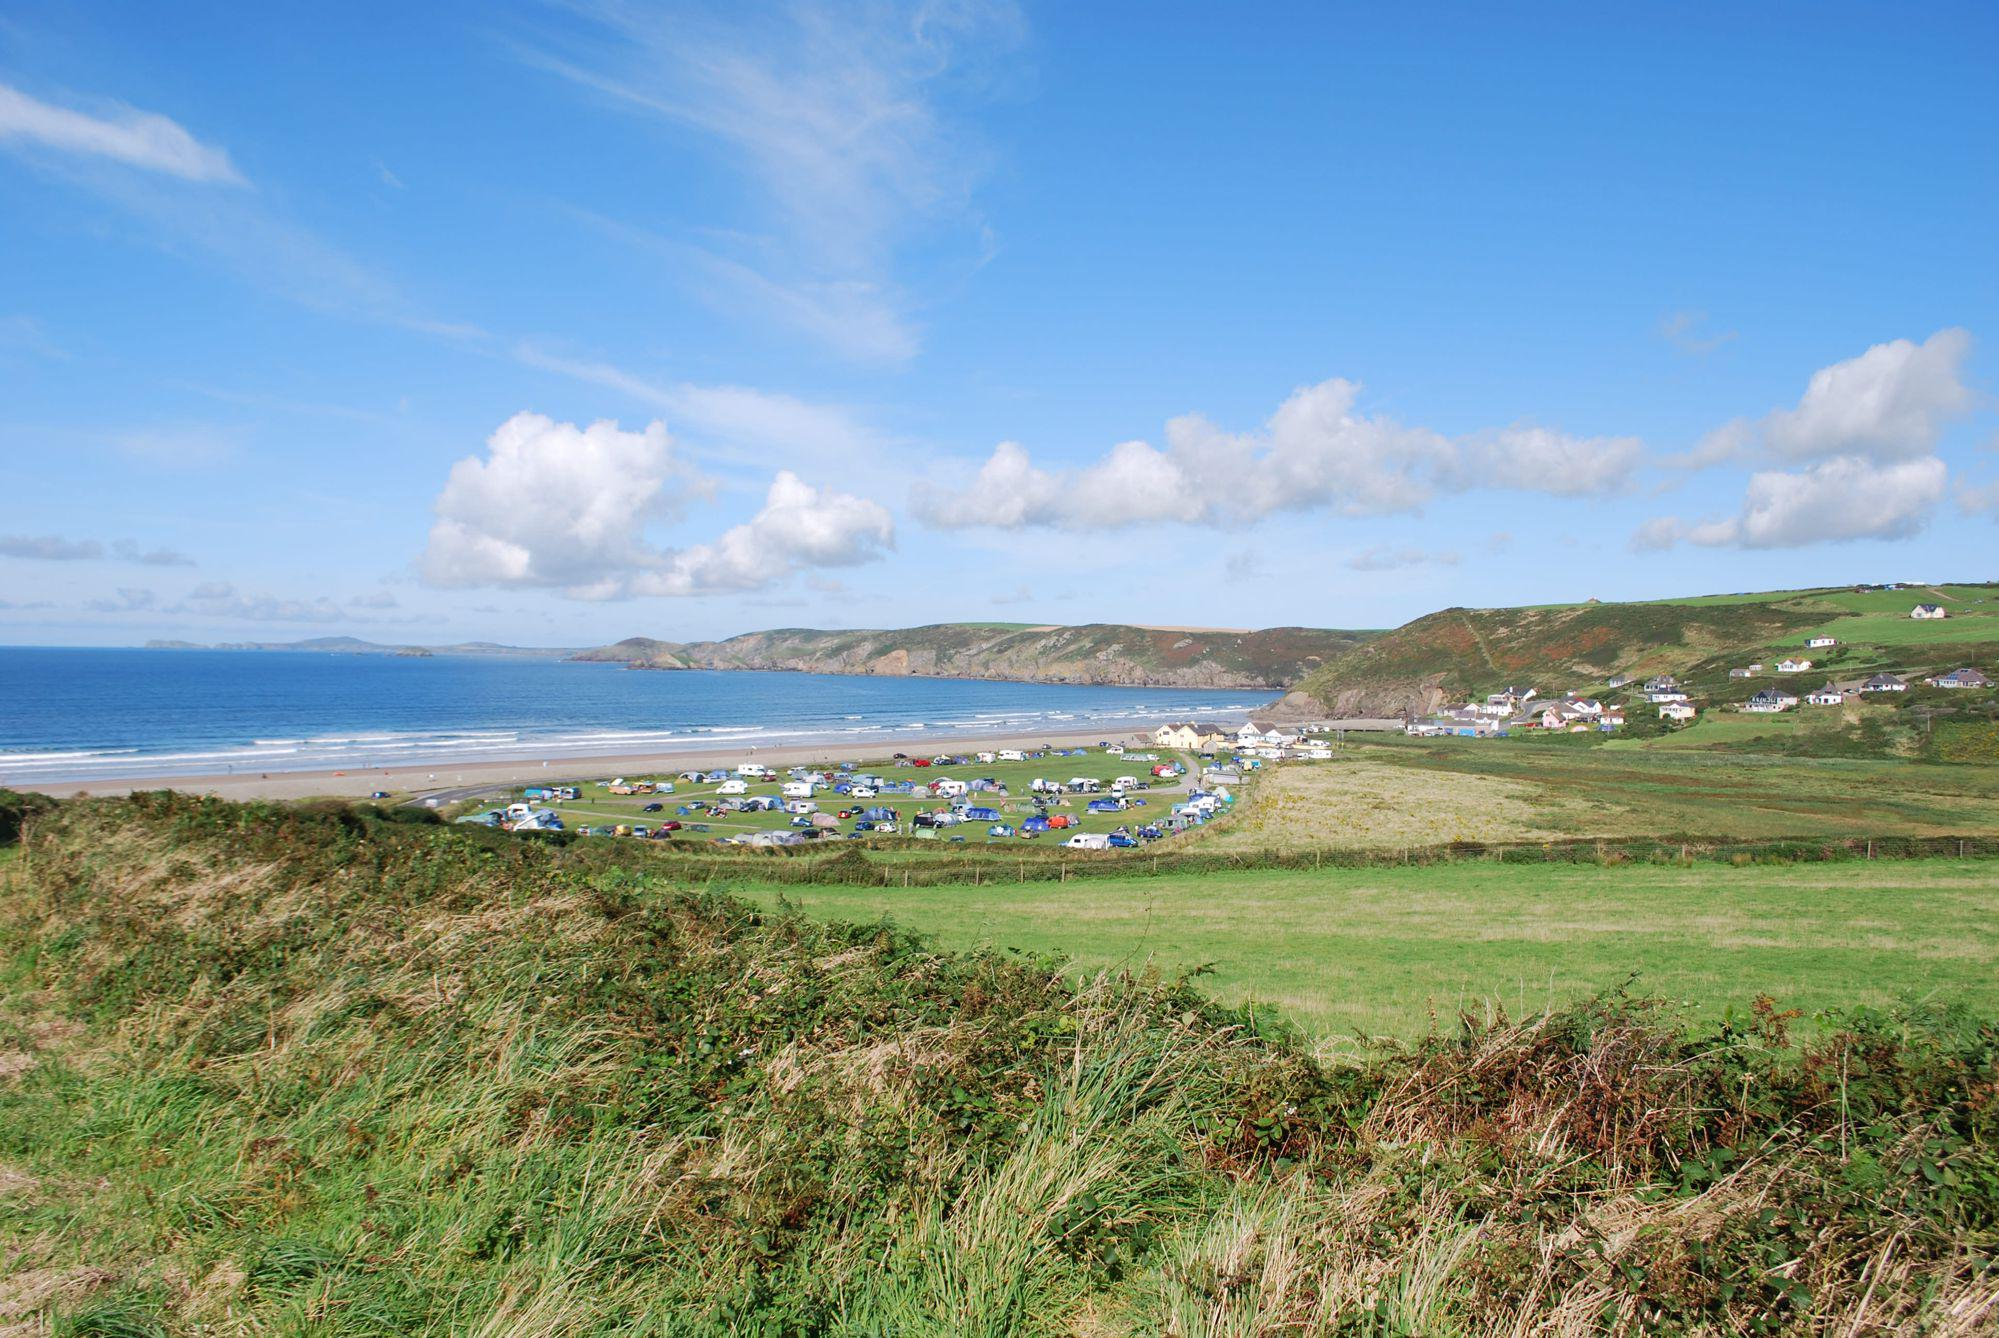 Newgale Camping | Best campsites in Newgale, Pembrokeshire